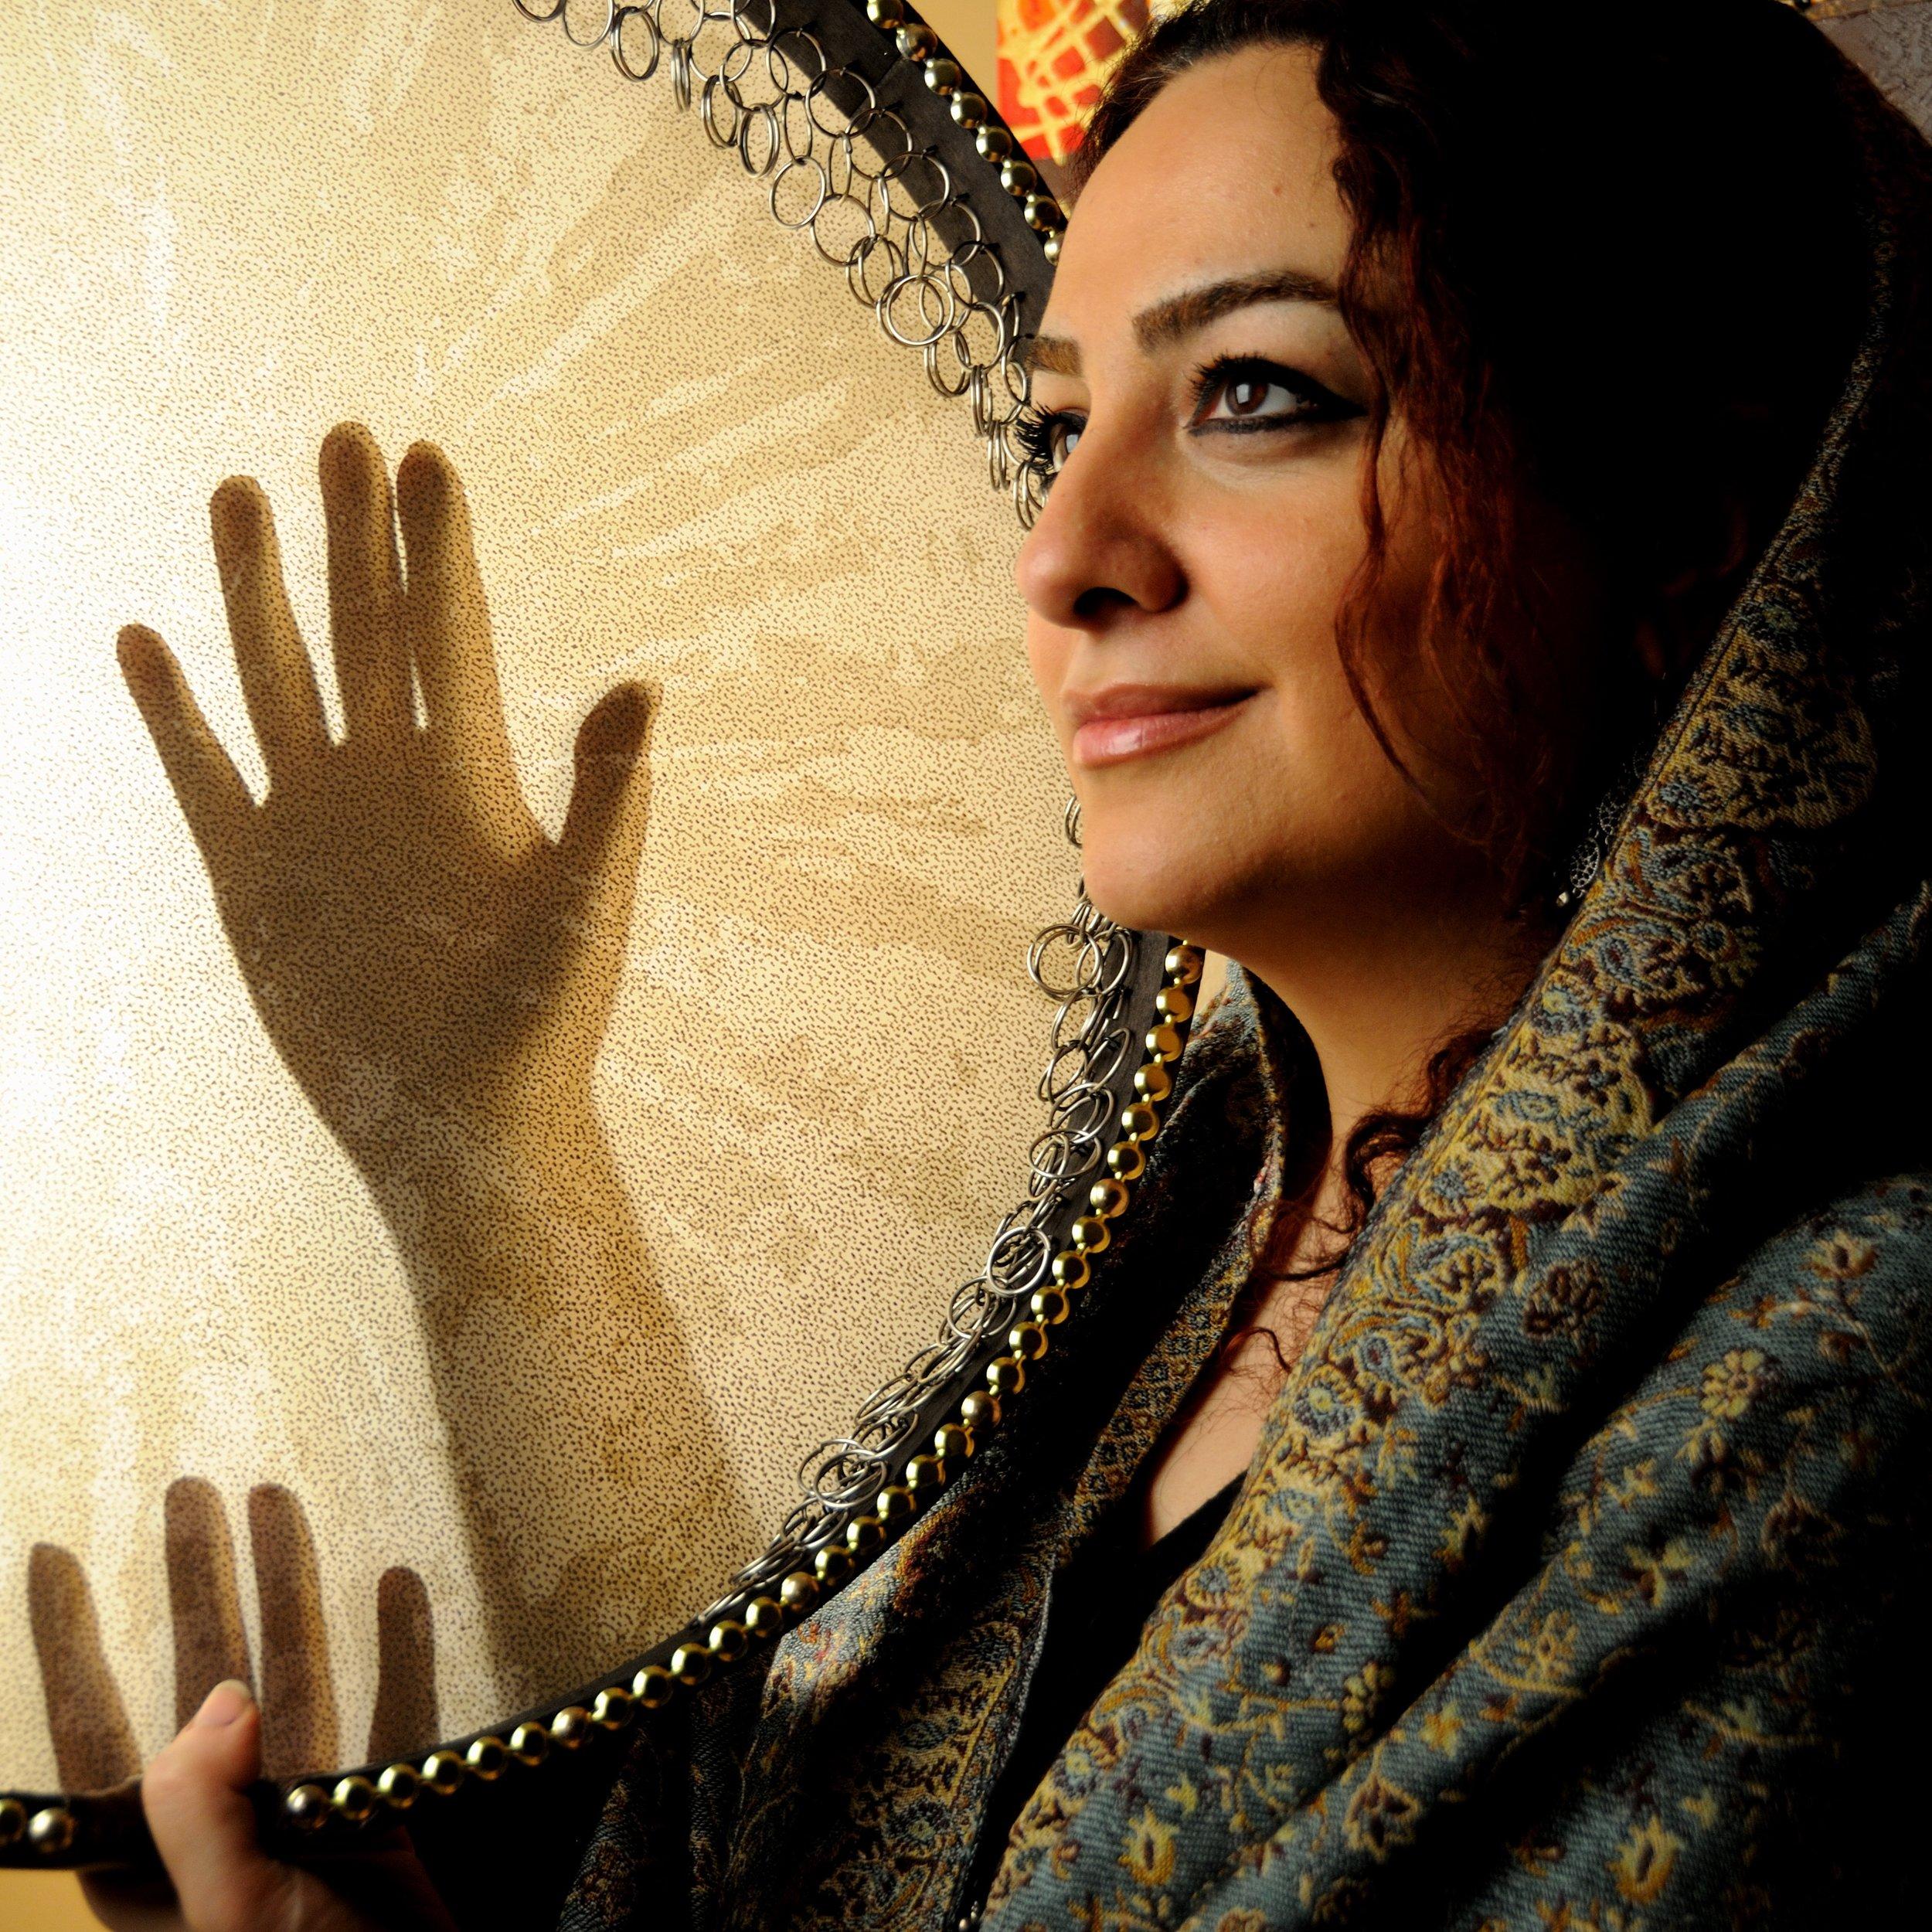 Naghmeh Farahmand 1 by Samira Hafezi .JPG